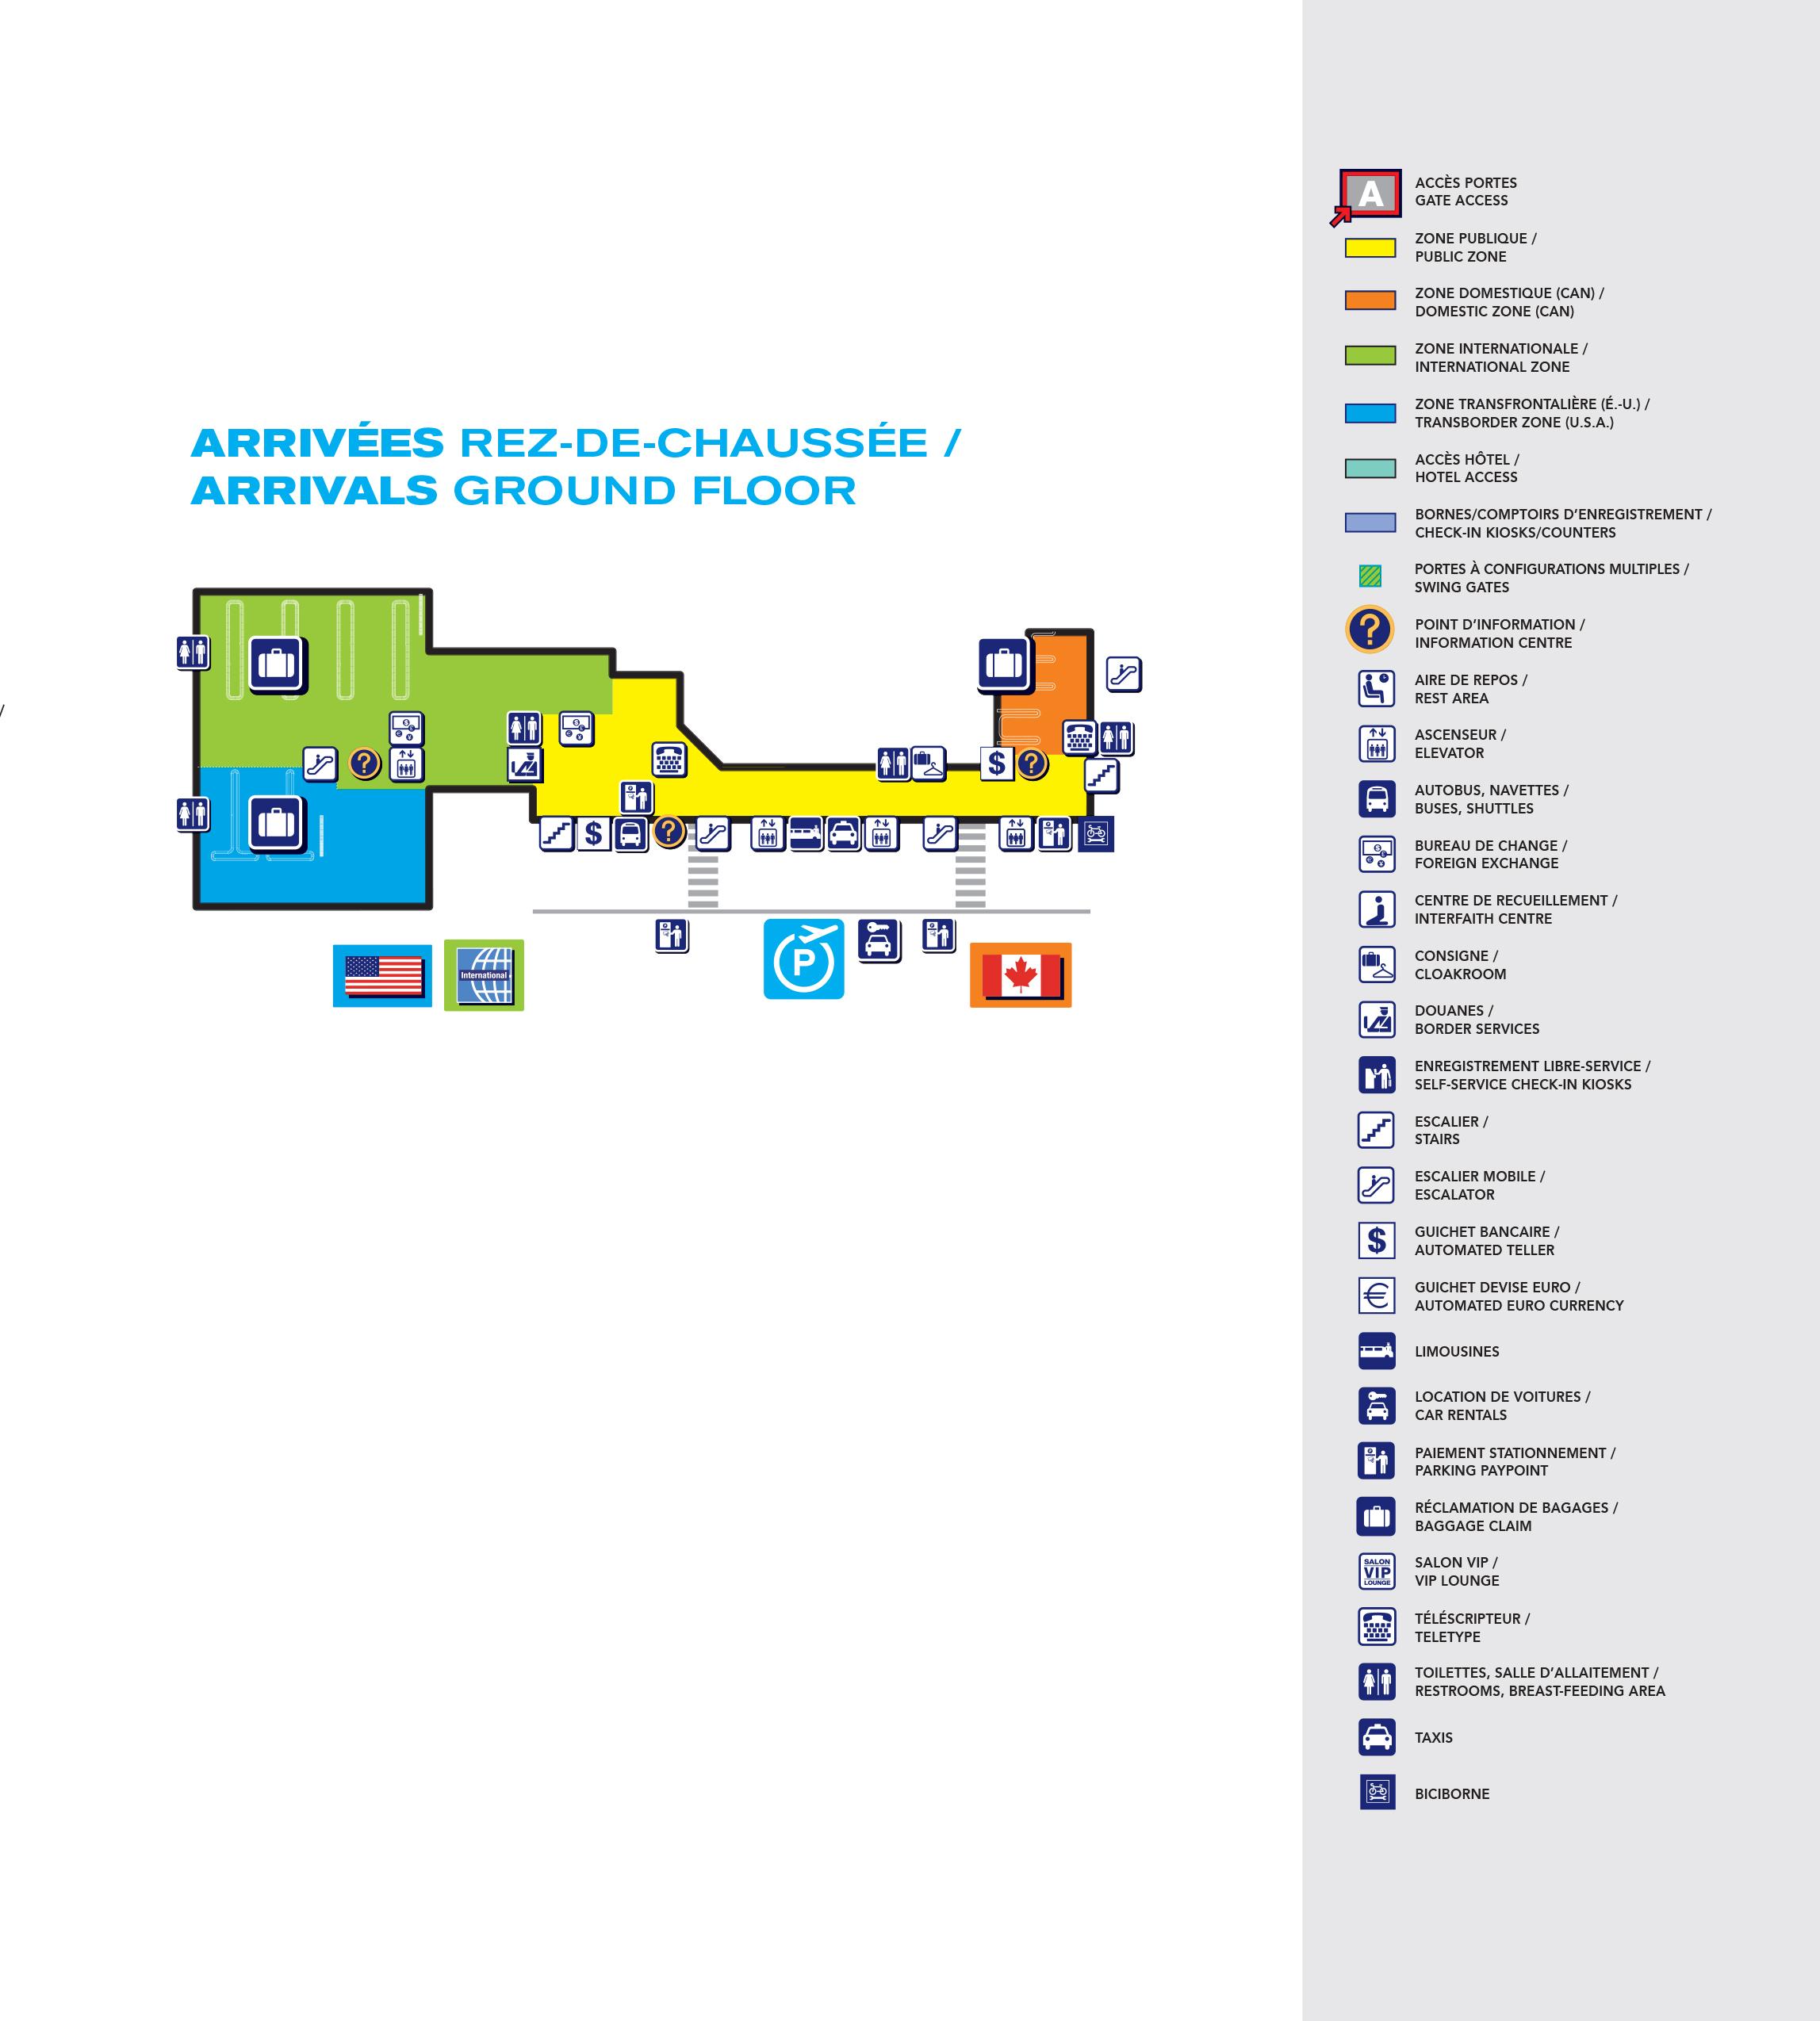 Montreal-Pierre Elliott Trudeau International Airport Map ...